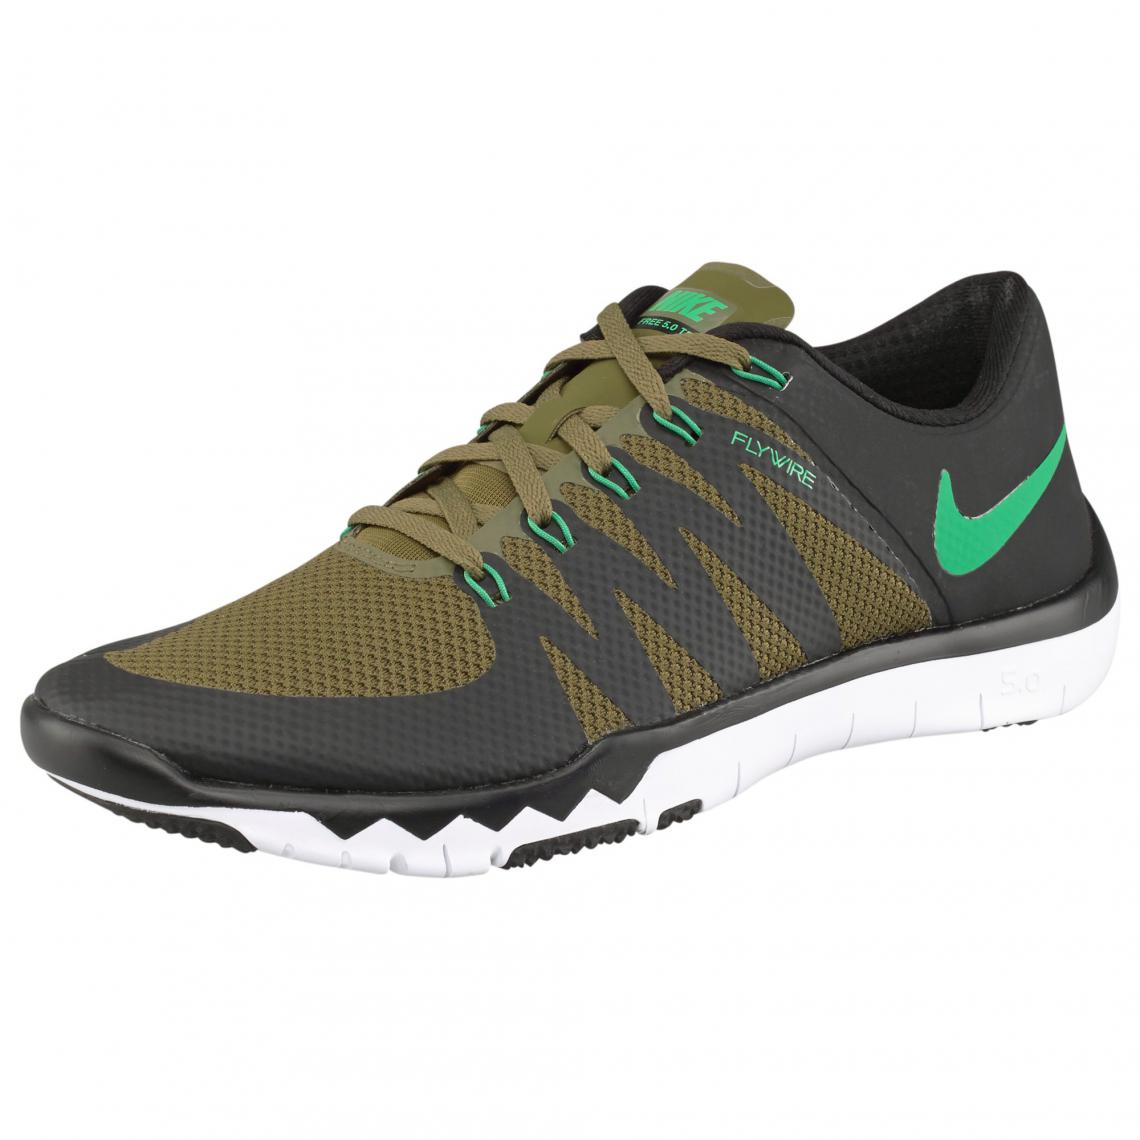 revendeur a13cf b3a12 Nike Free Trainer 5.0 chaussures de training basses homme ...